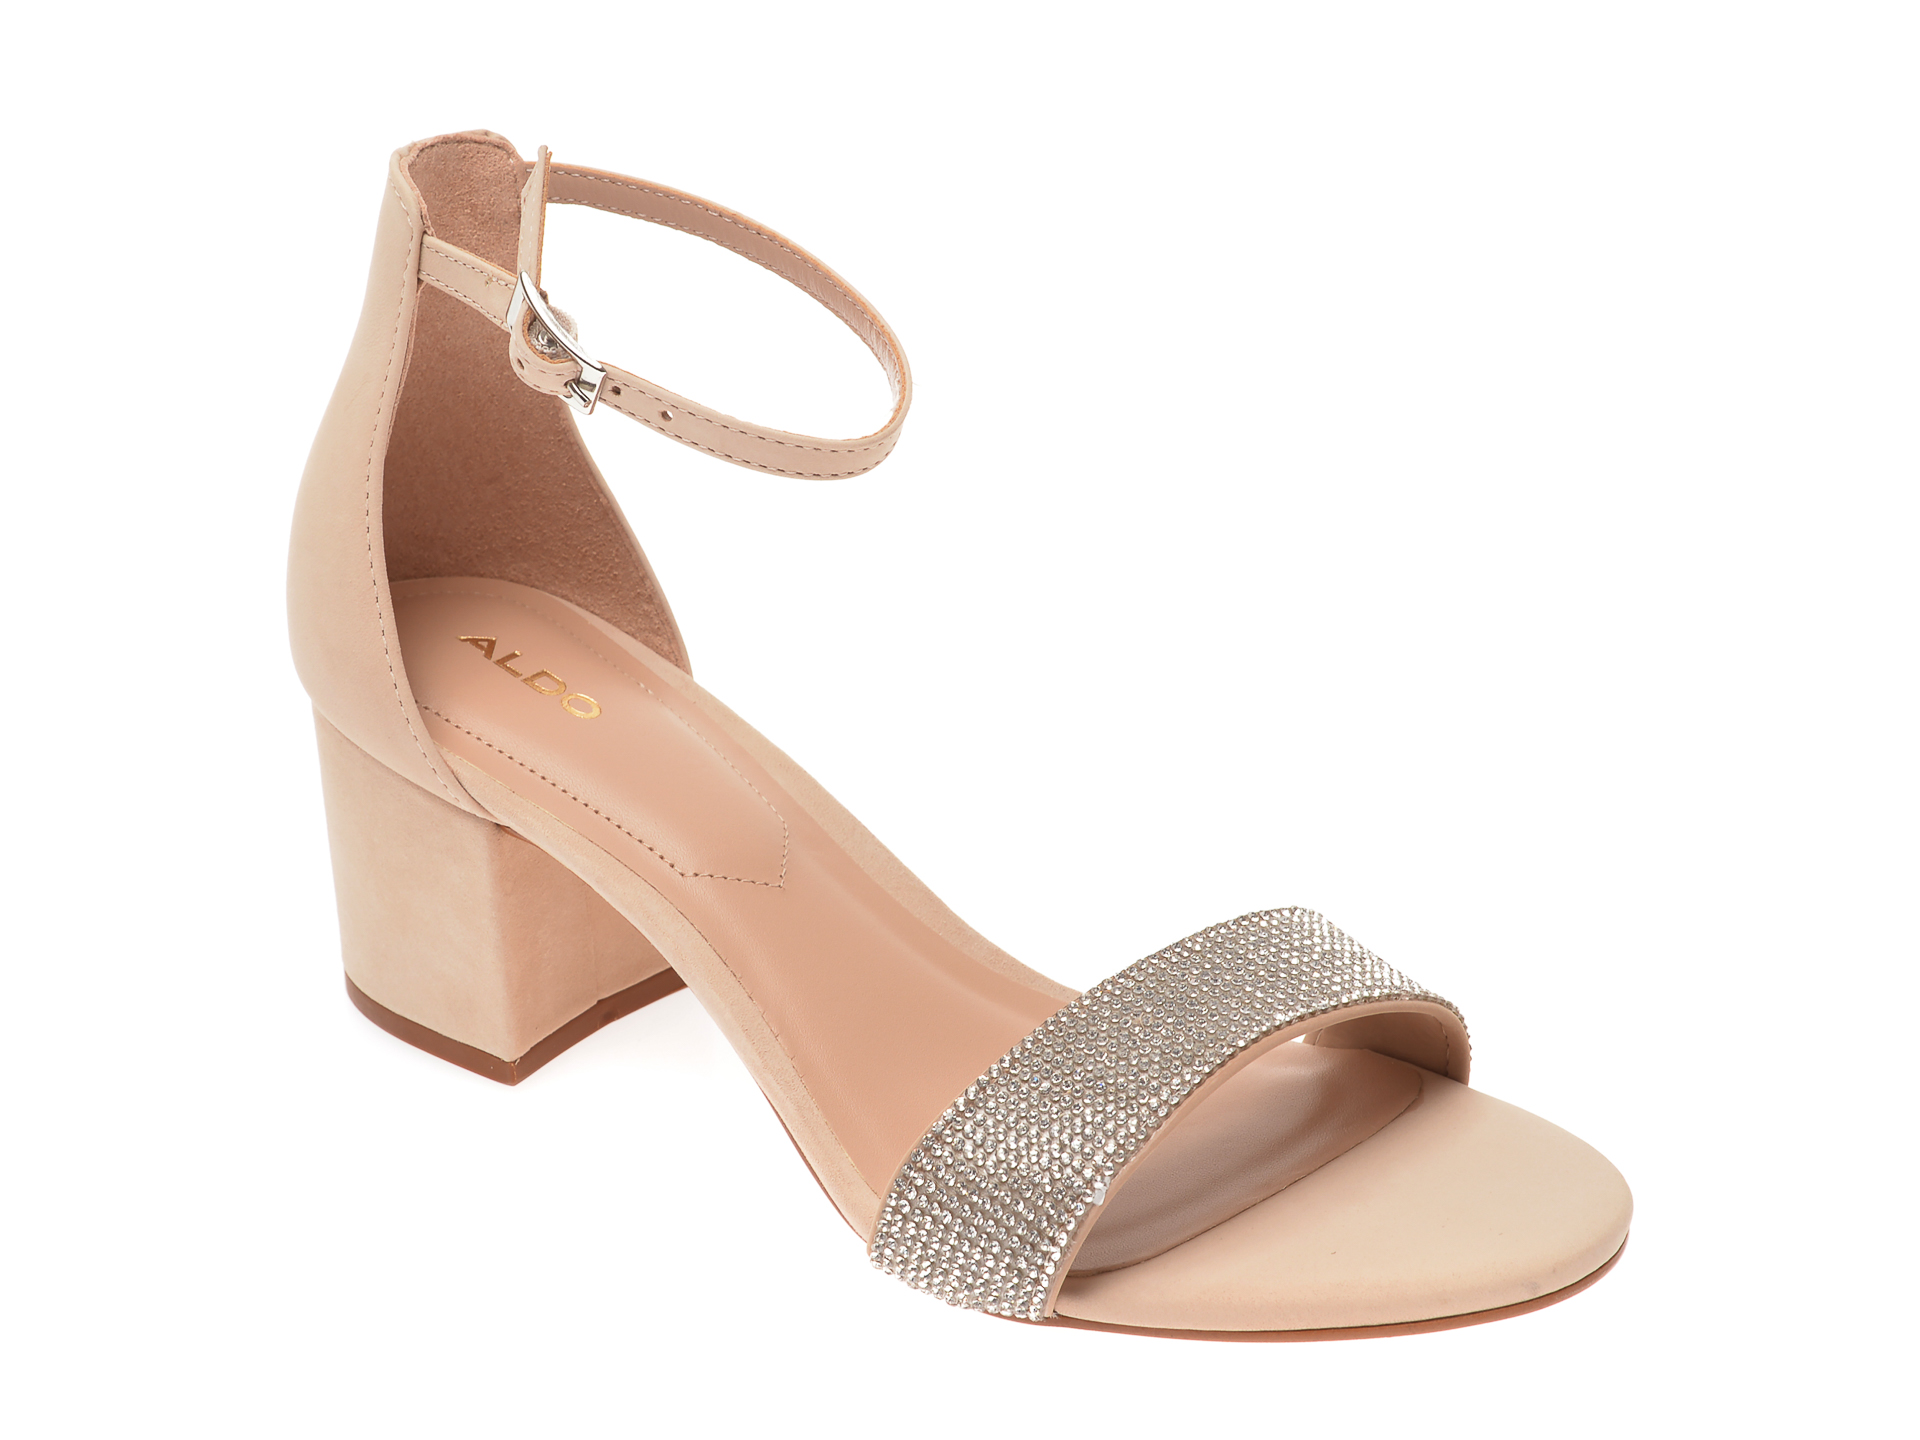 Sandale ALDO nude, Gladoniel270, din nabuc imagine